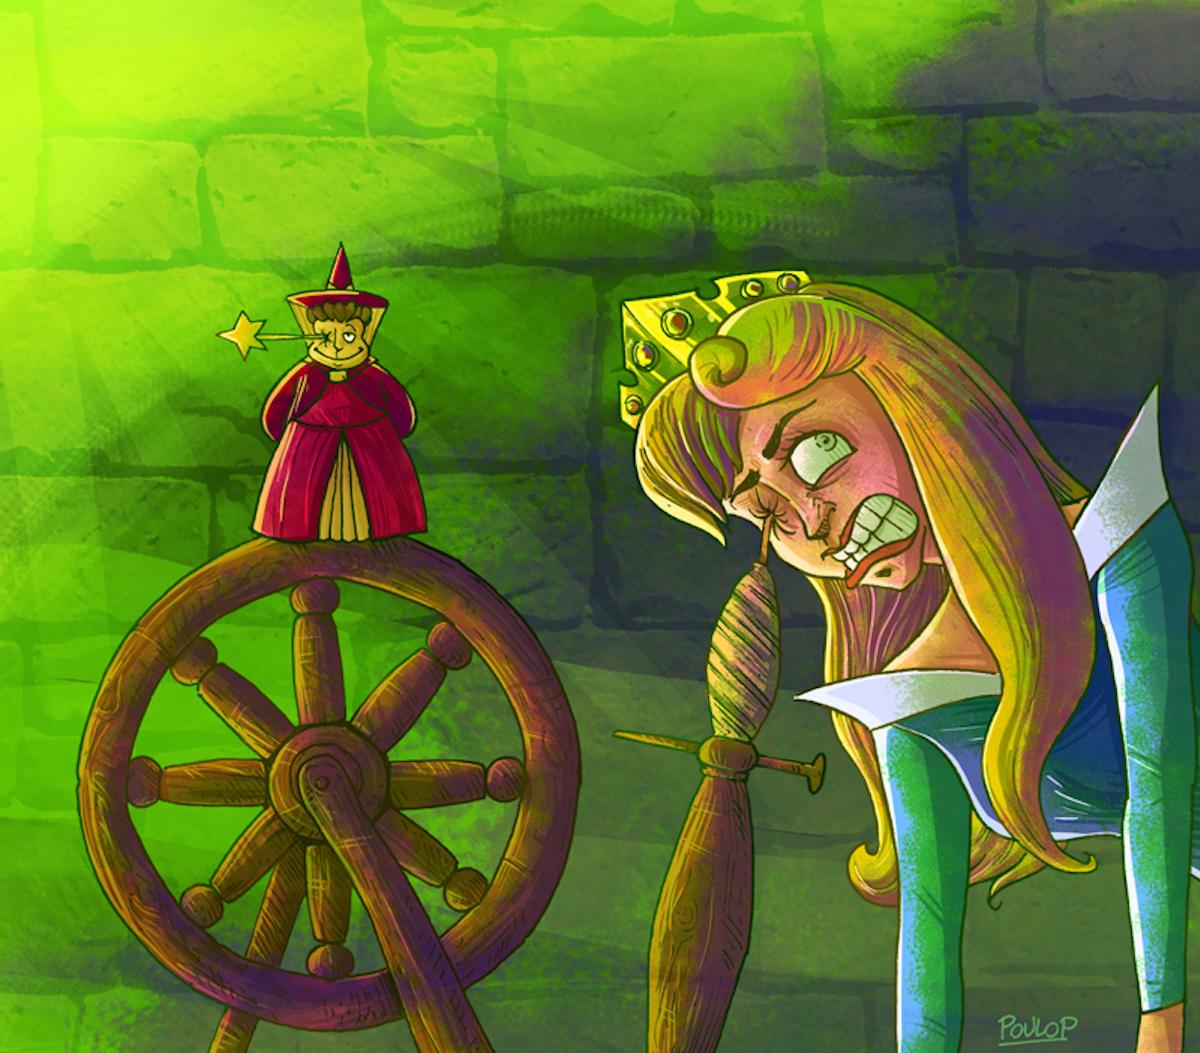 Princesse Disney Poulop